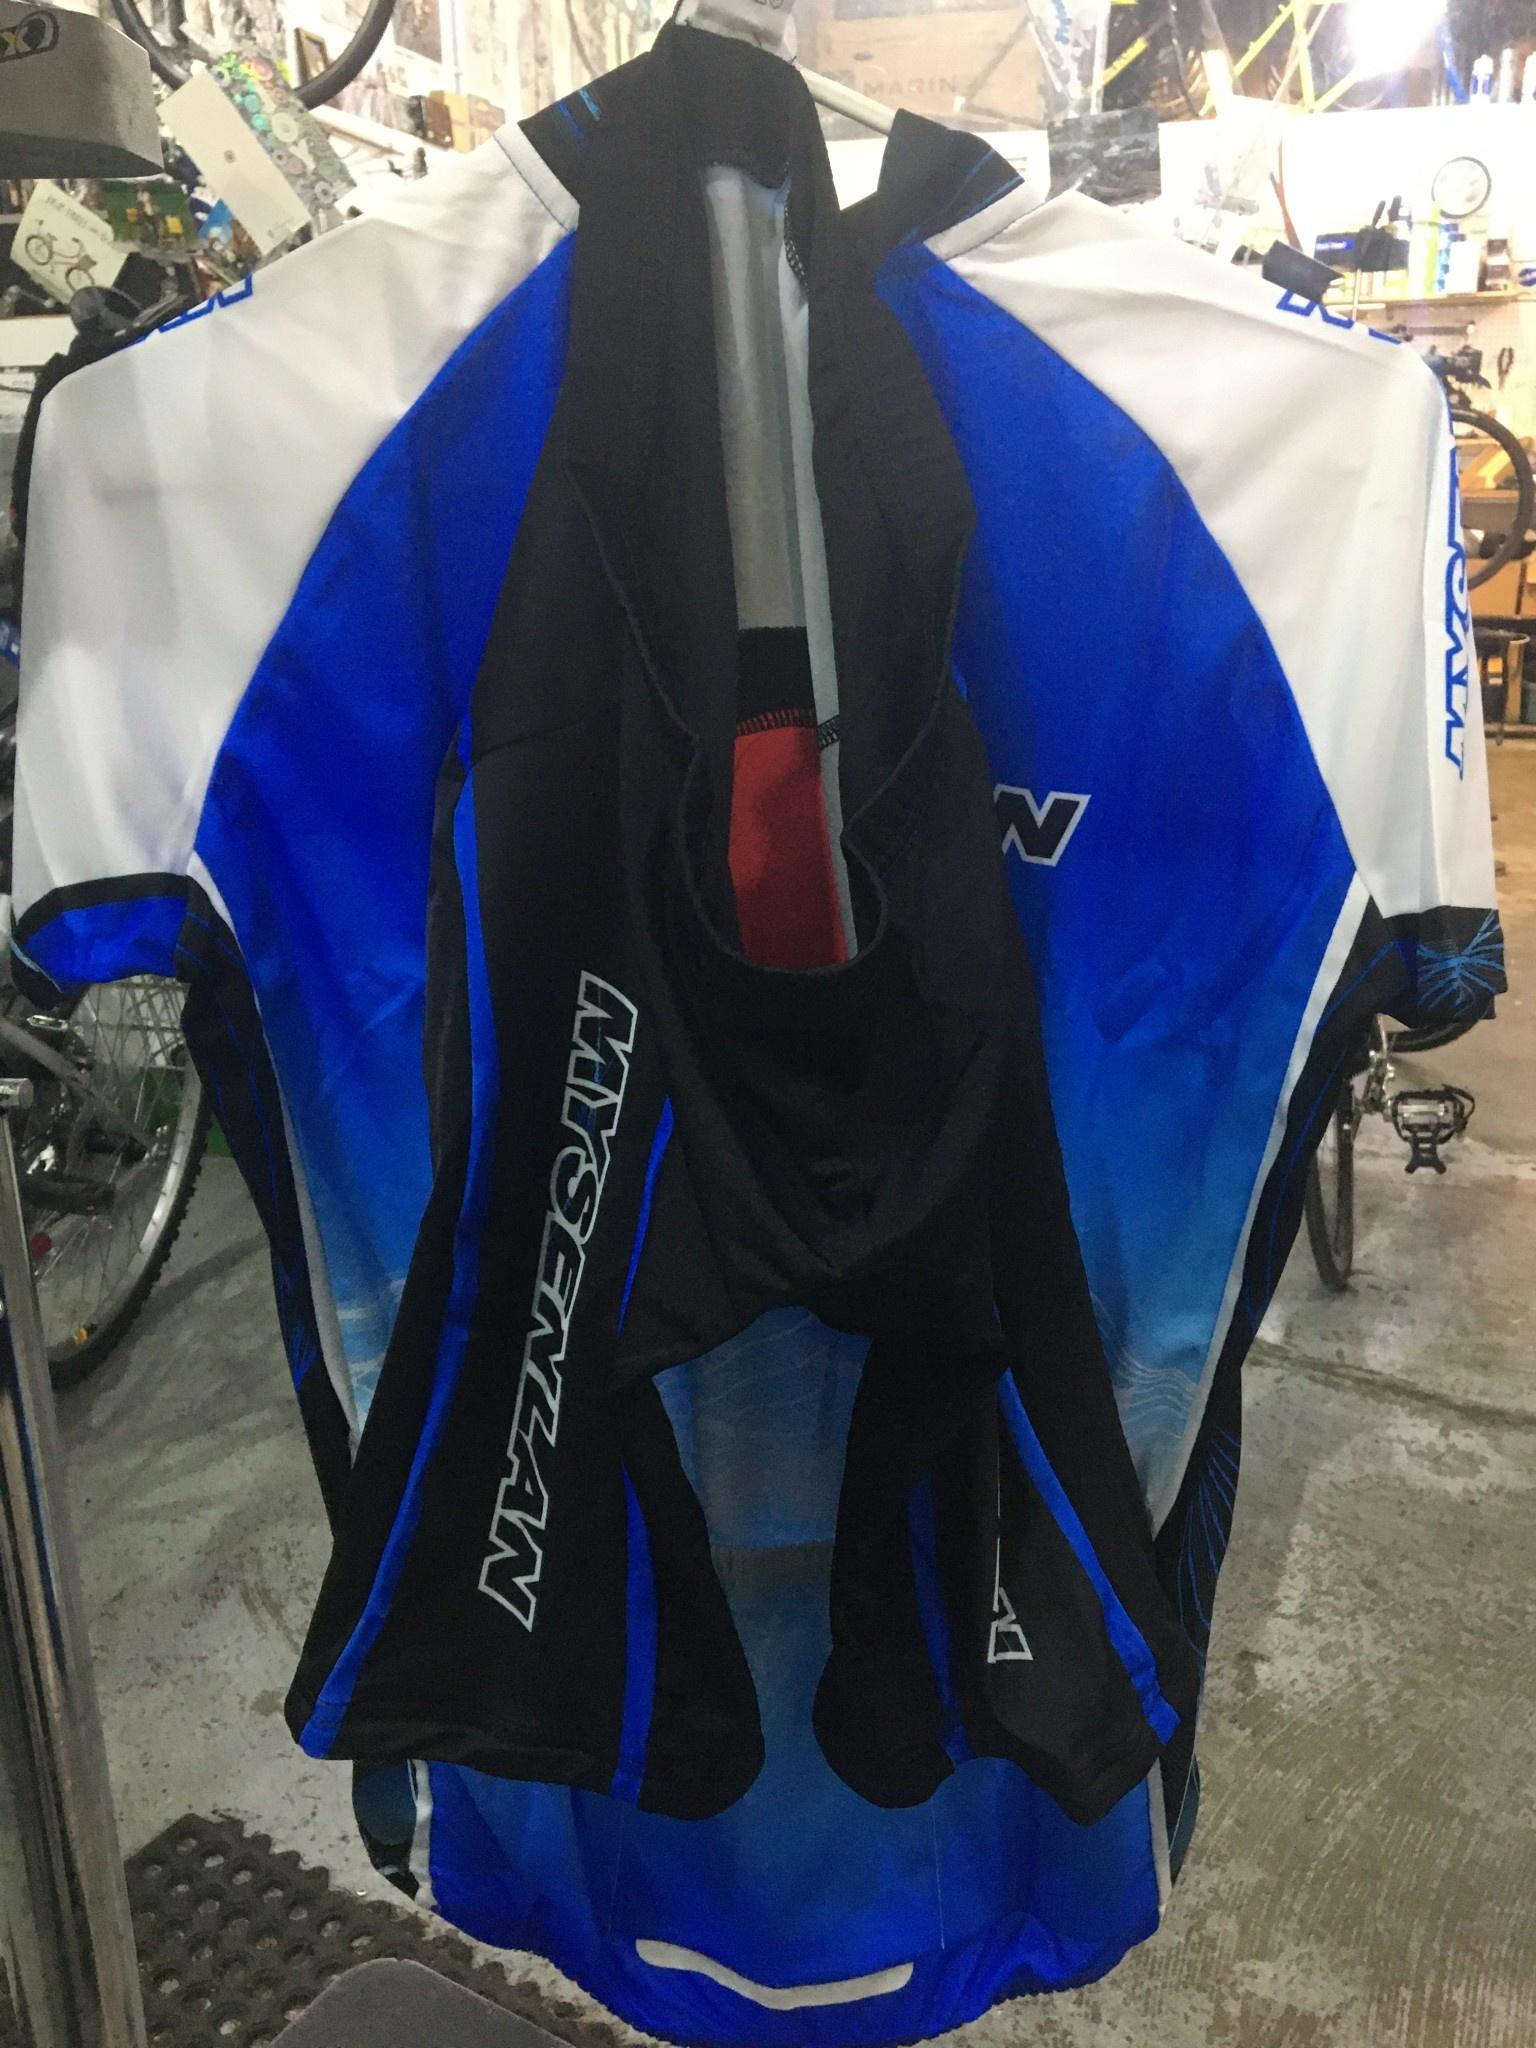 MySenlan Mysenlan Blue/White/Black Short Sleeve Jersey+Shorts